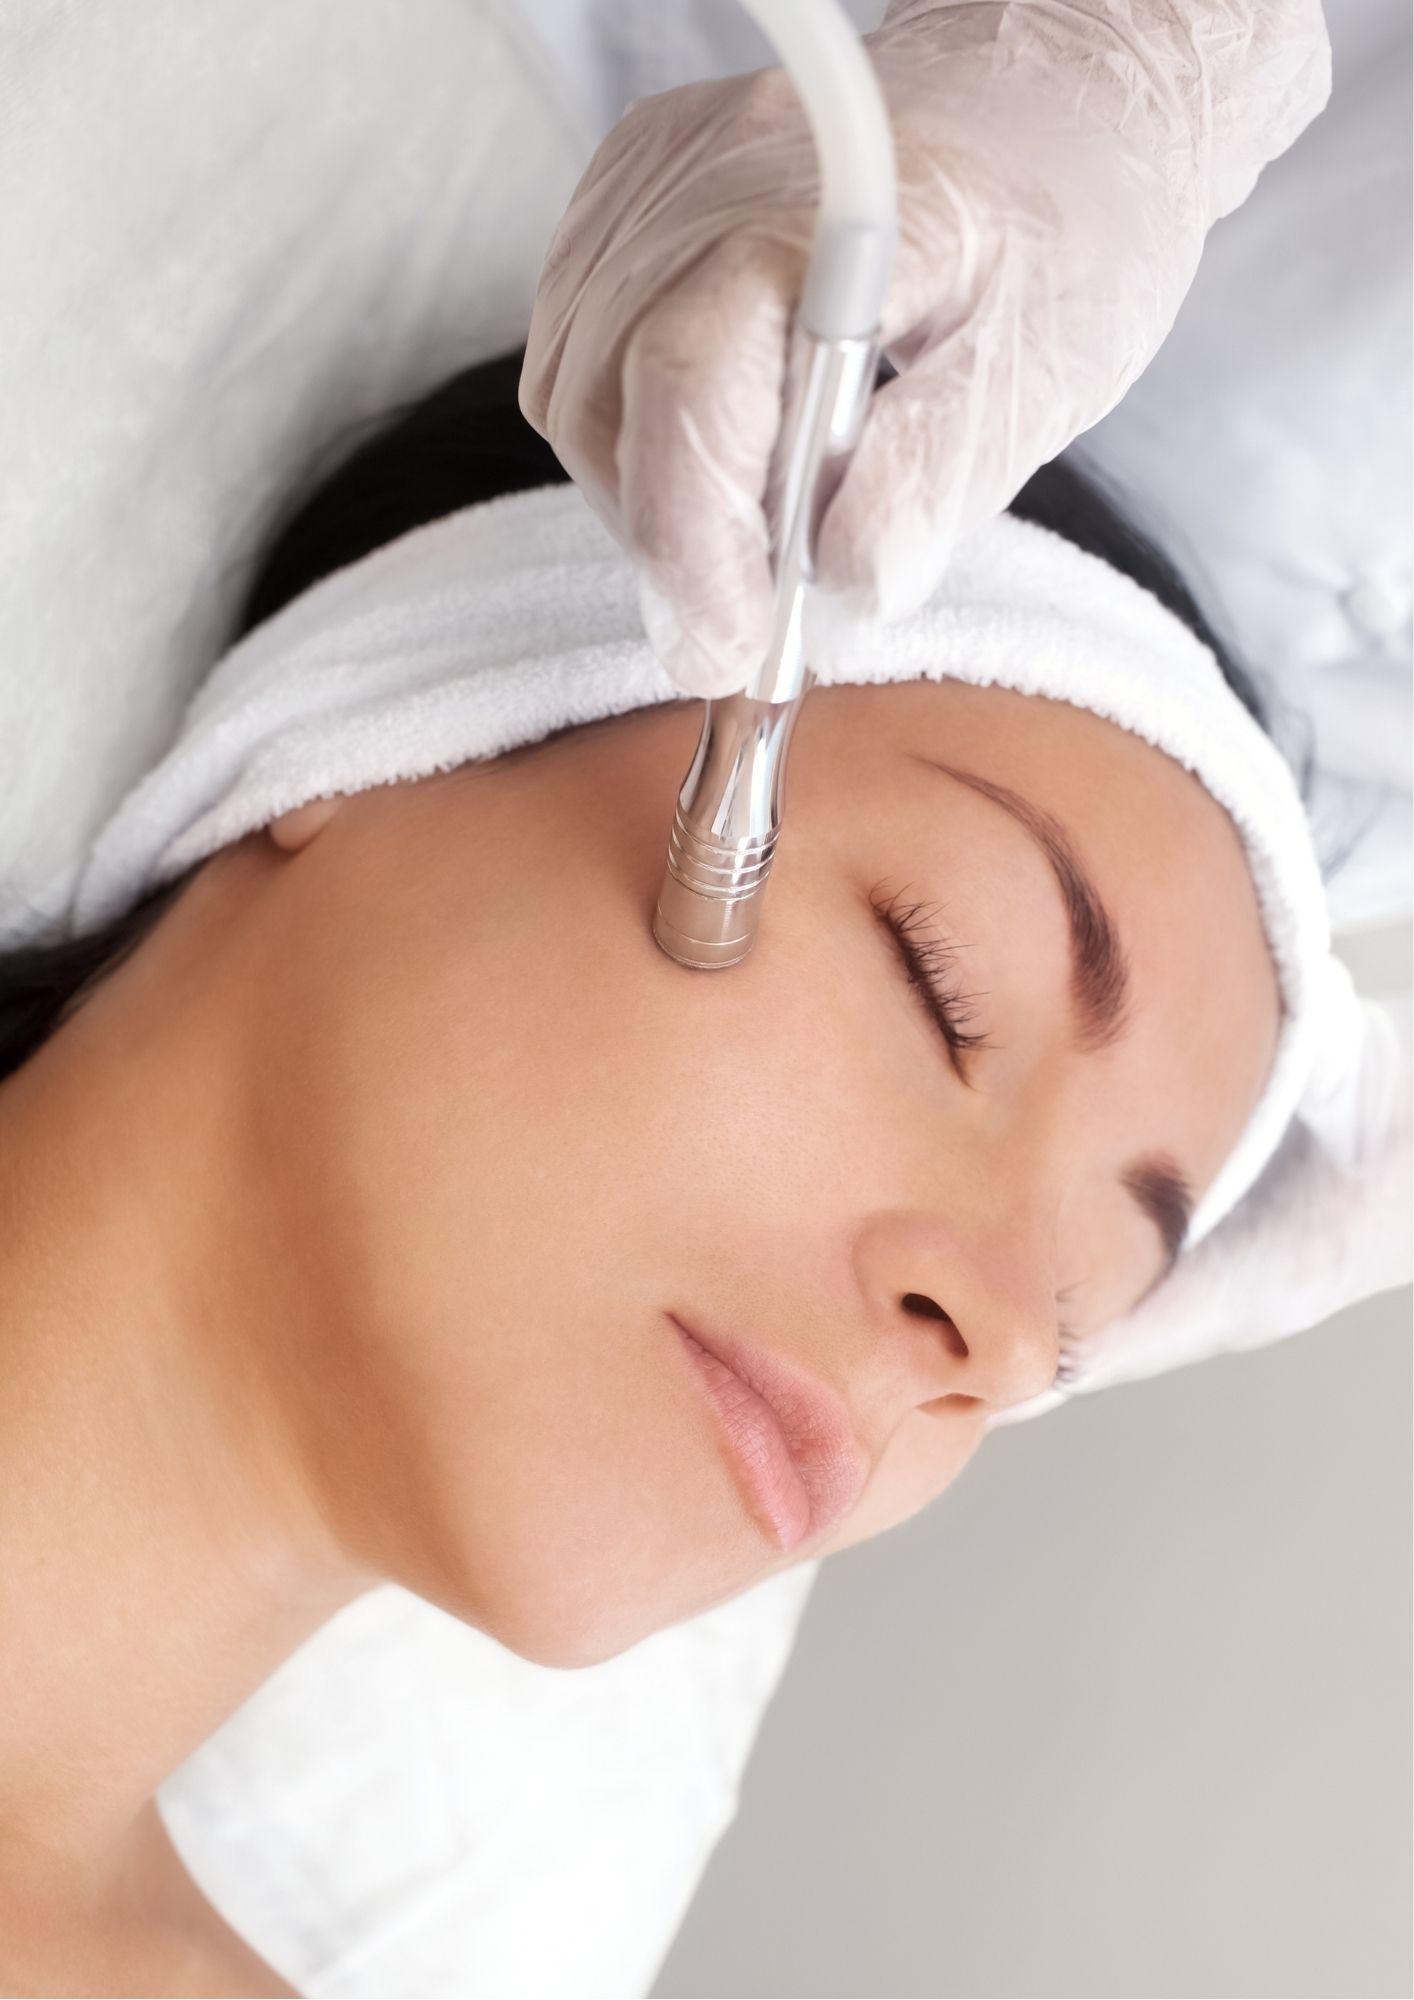 microdermabrasie cleyo beauty professional